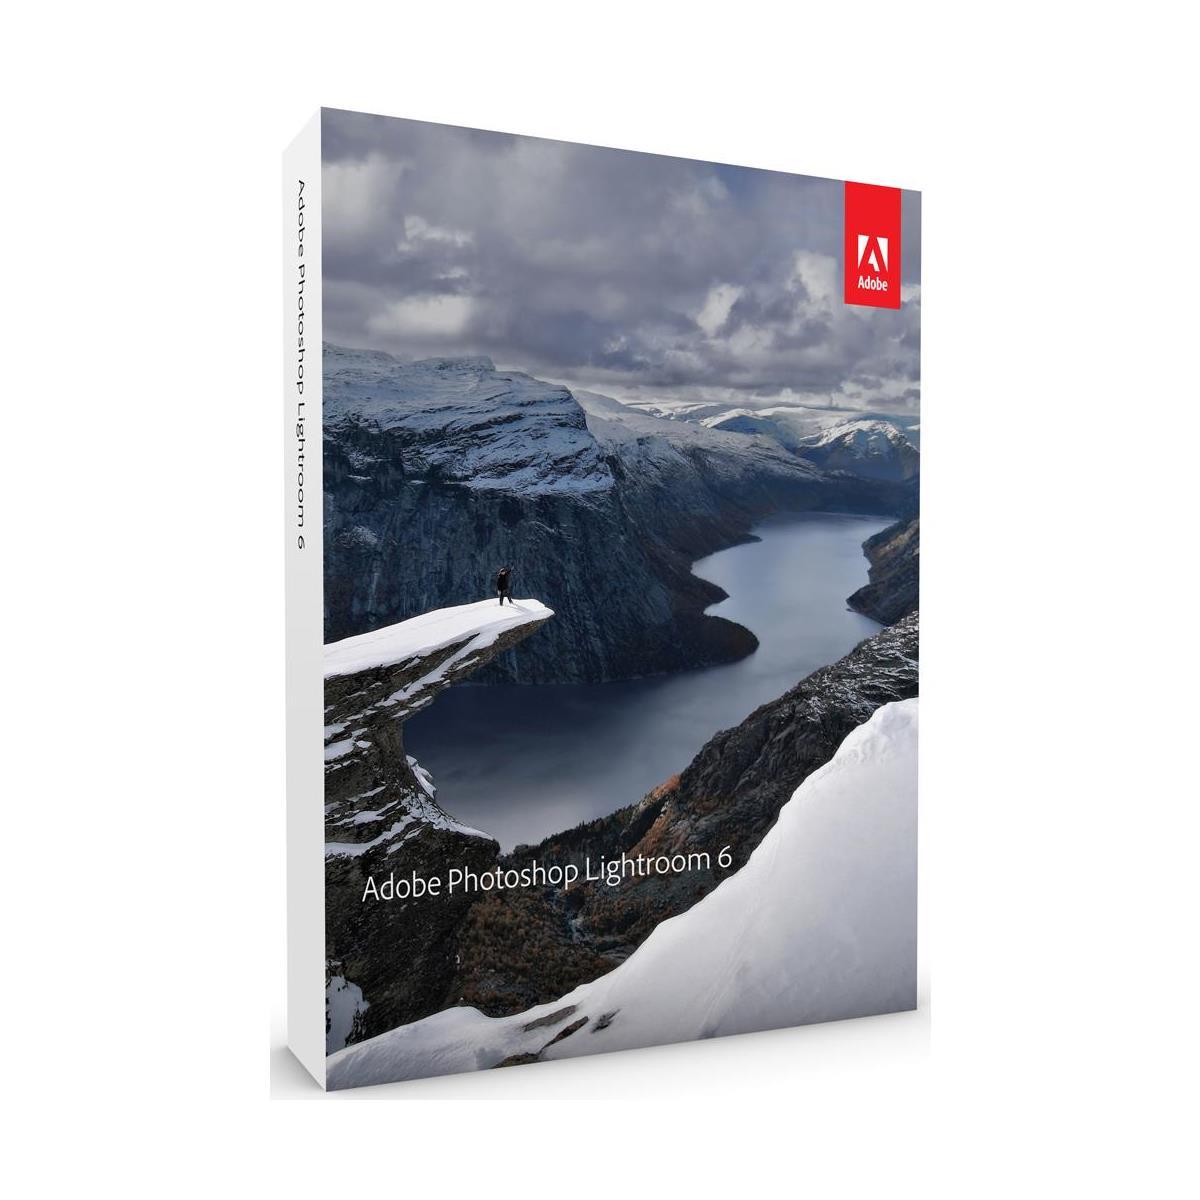 Adobe Photoshop Lightroom 5 0 Final 64 Bit Full Moonlight Skidrow